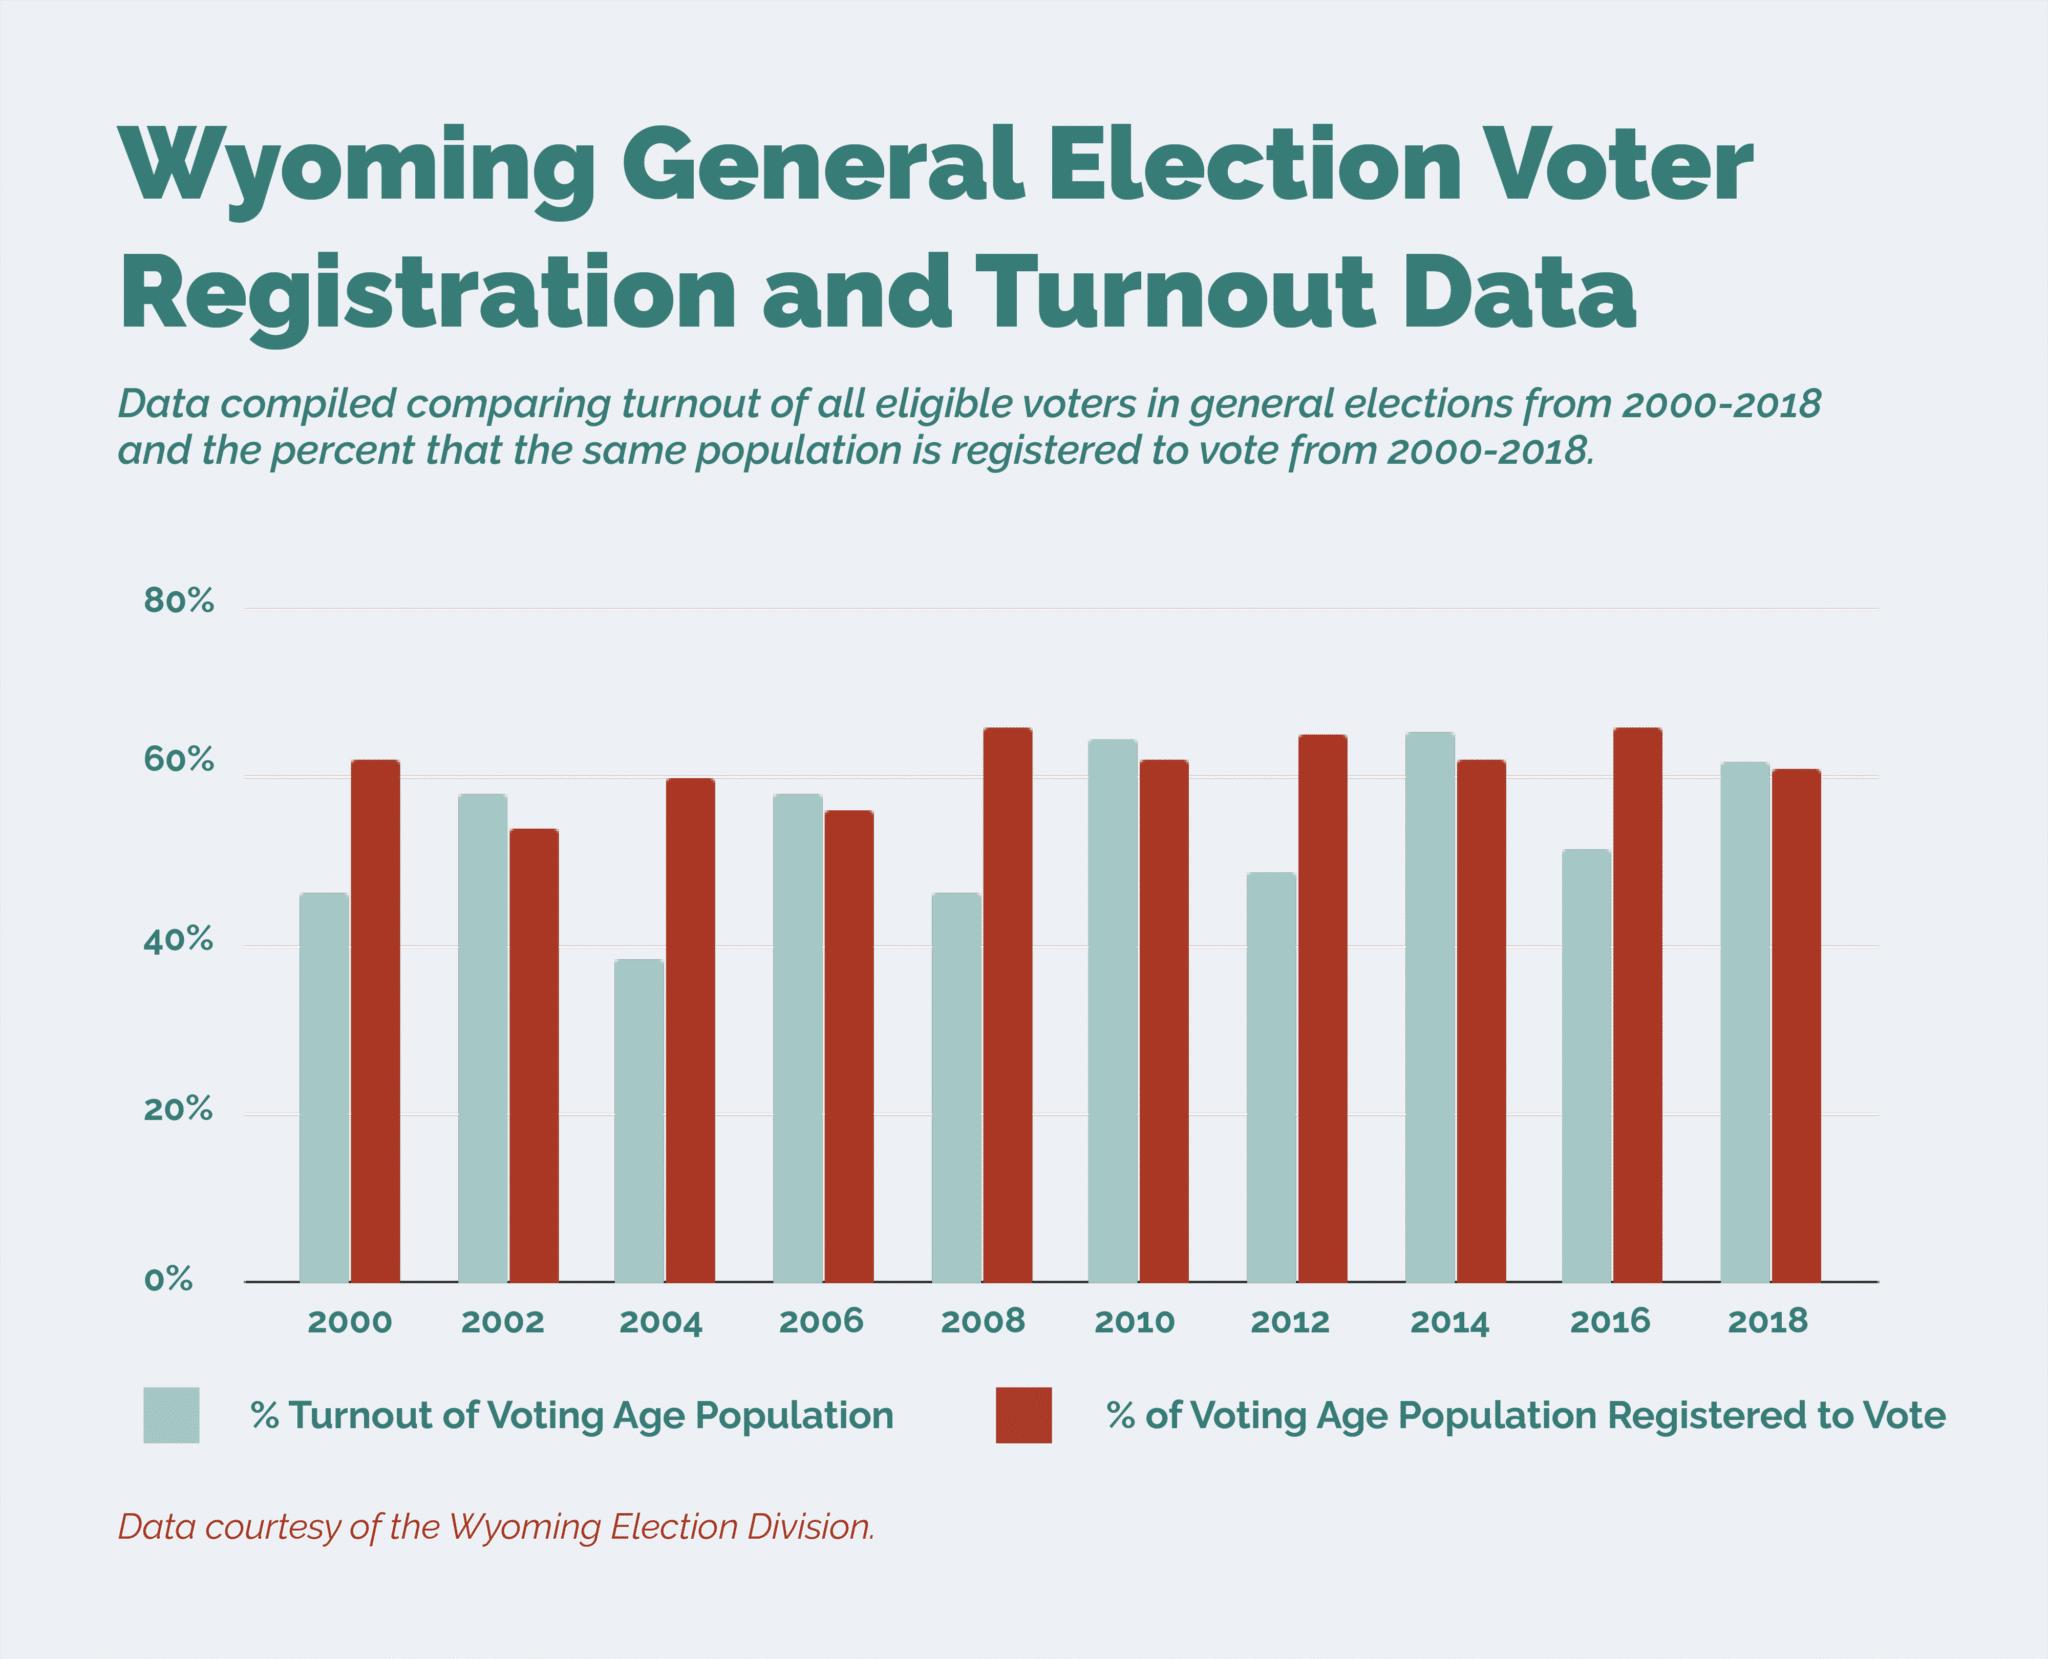 Voter registration and turnout in Wyoming general elections. (Eda Uzunlar)